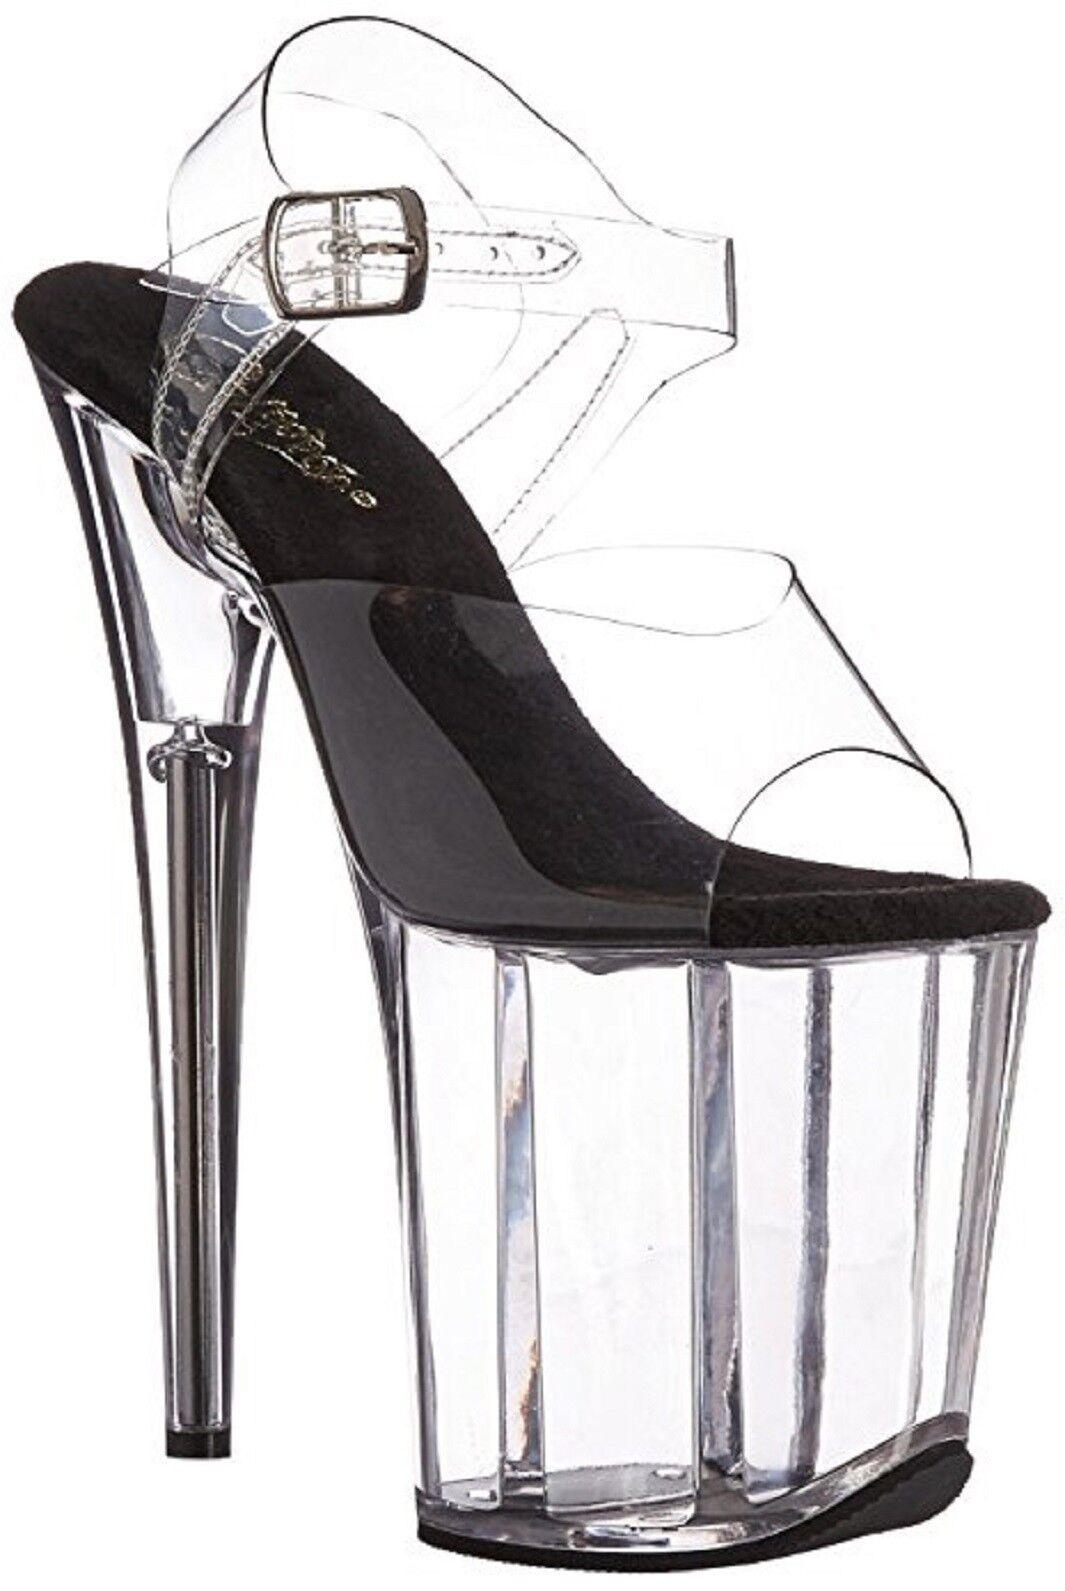 Pleaser Flamingo-808 Exotic Dancing Schuhes, Super High Heels 8